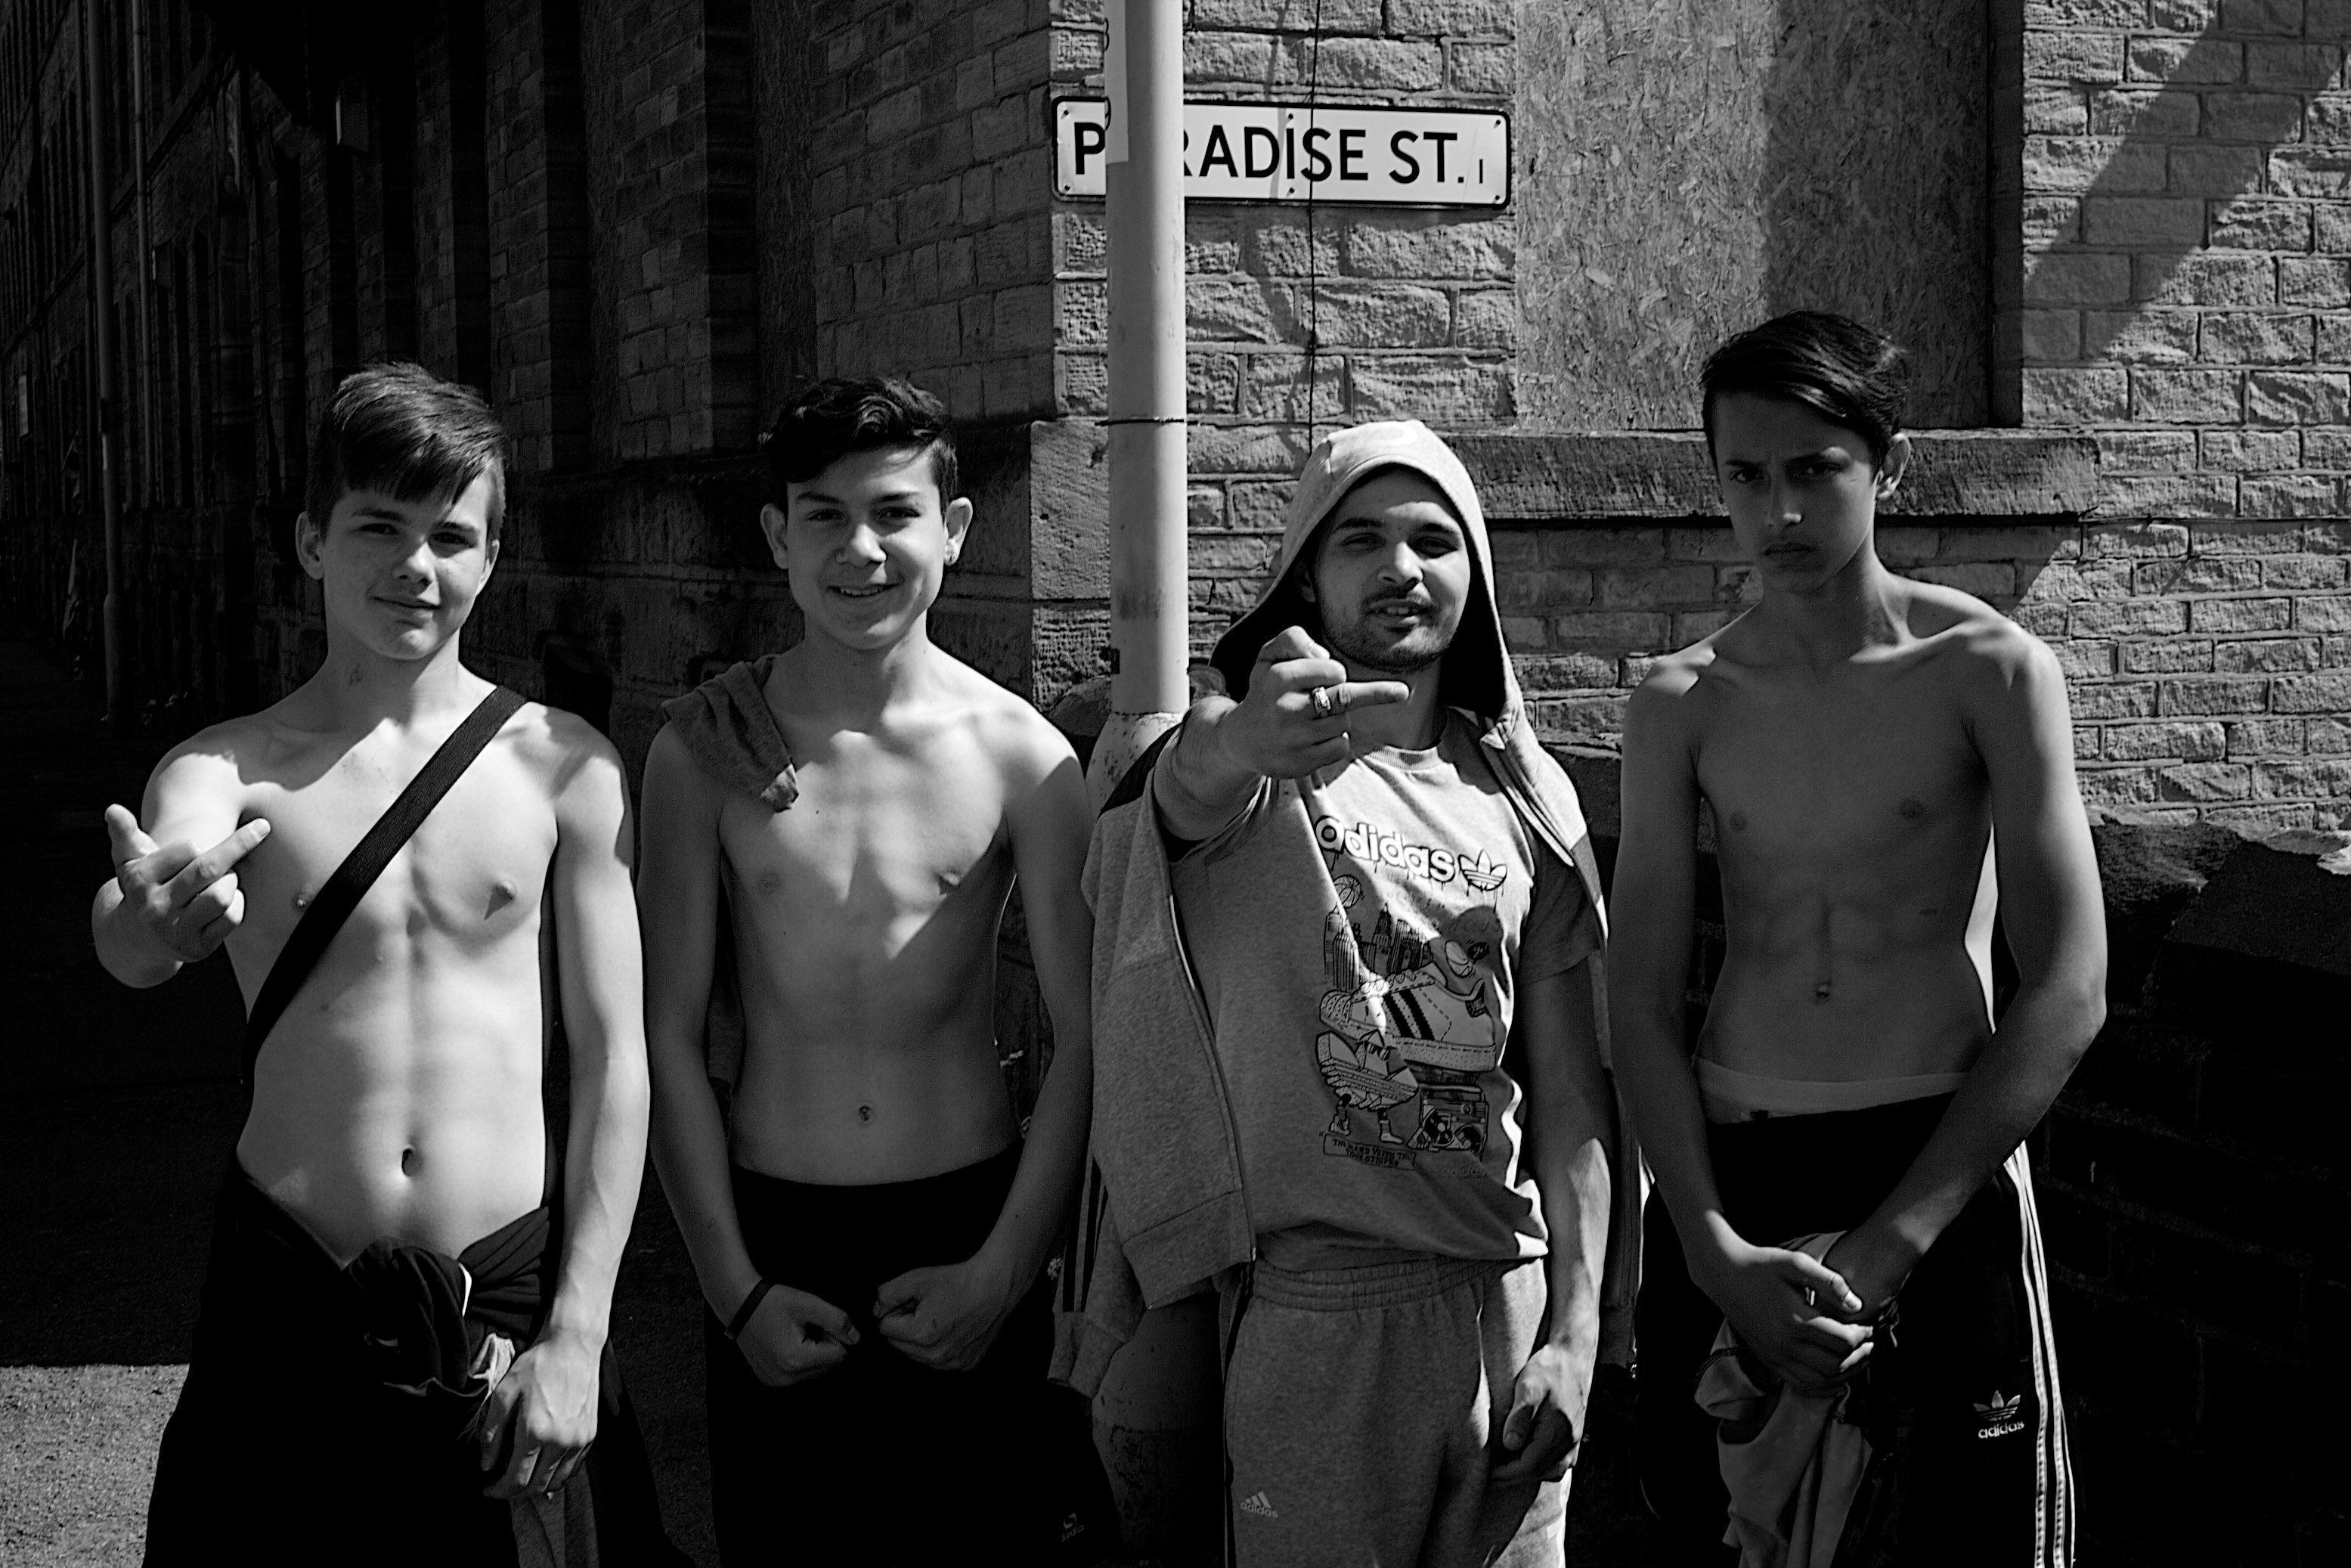 Paradise St. Bradford lads.